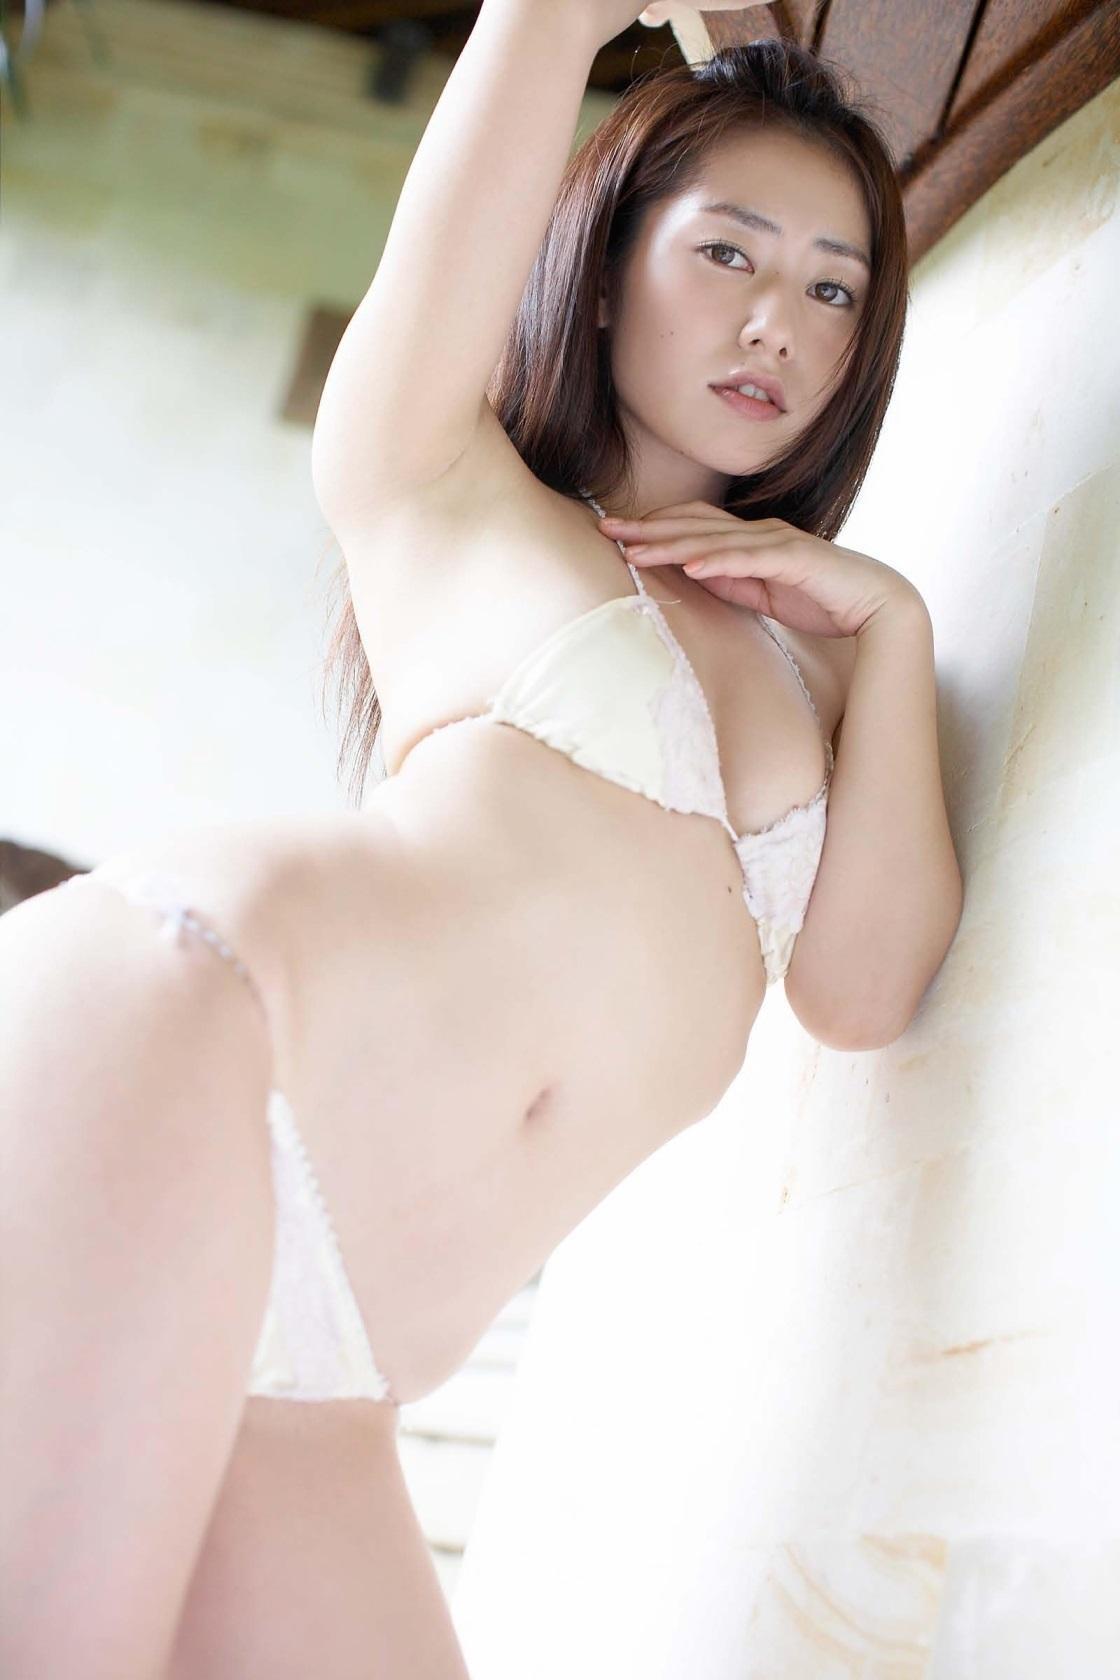 tani_momoko240.jpg